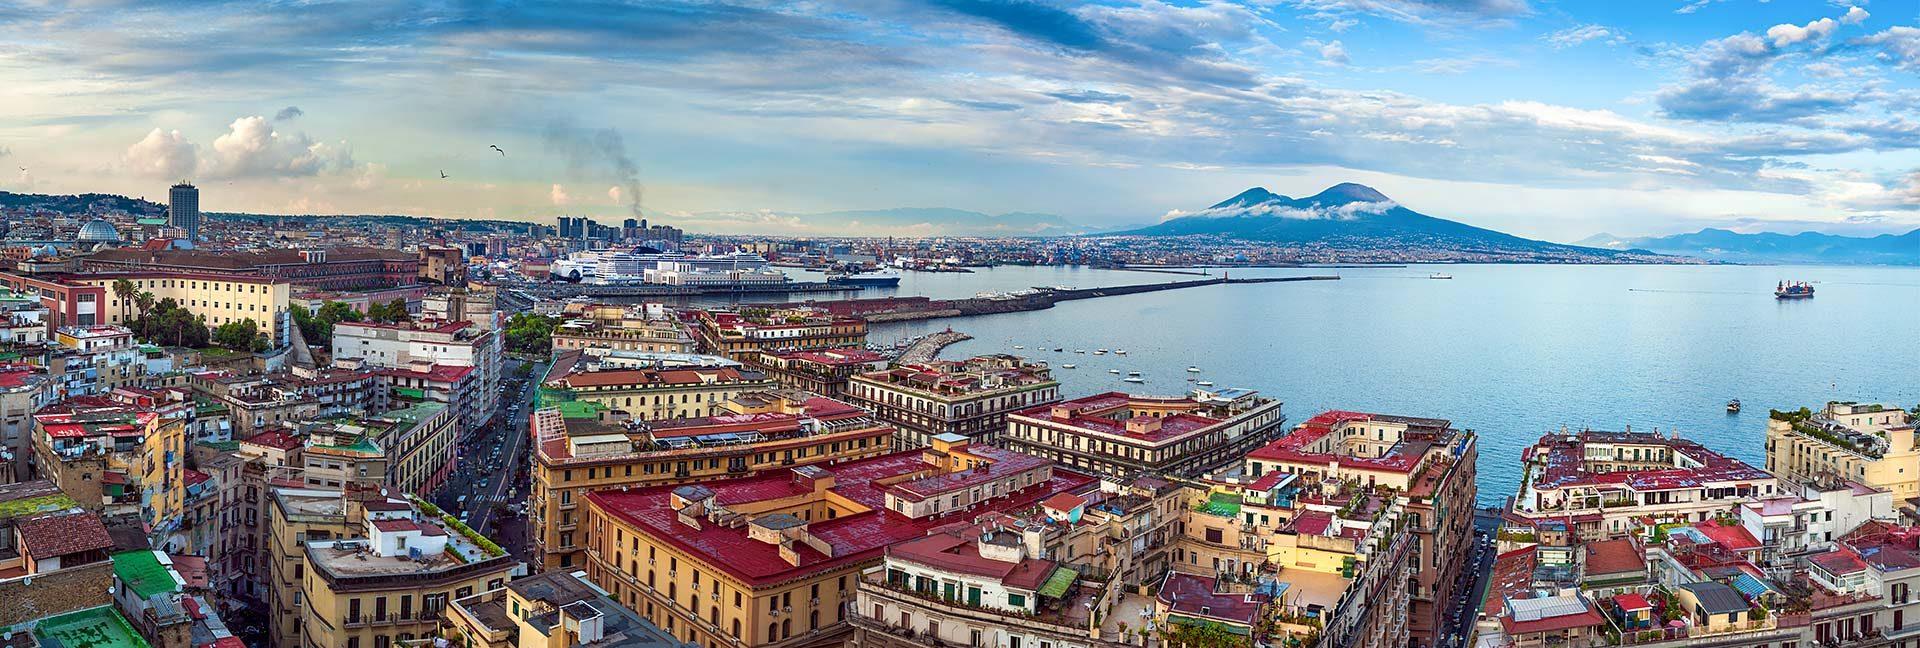 Napoli Avvocato